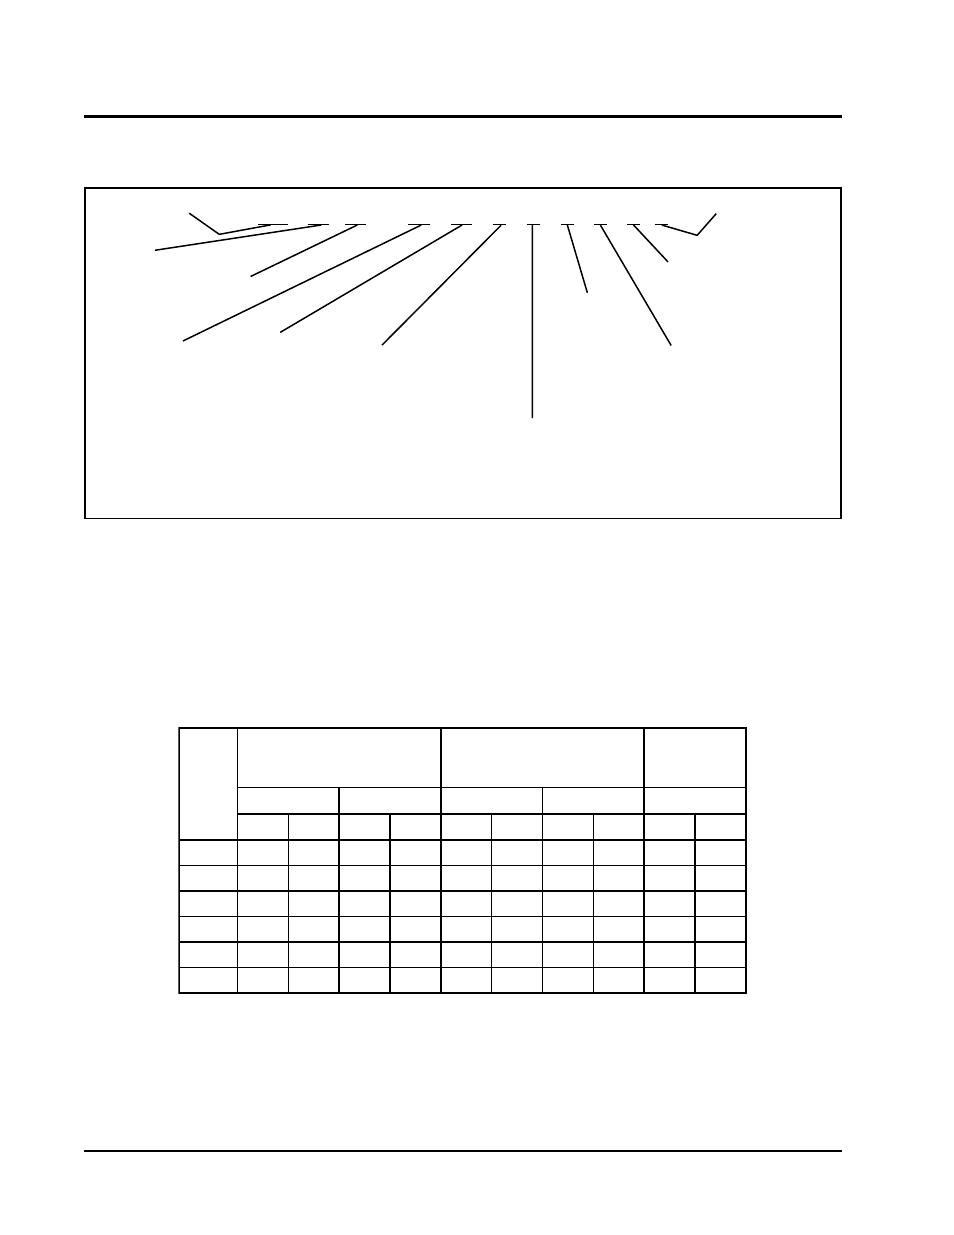 Wall mount general information | Bard WA602 User Manual